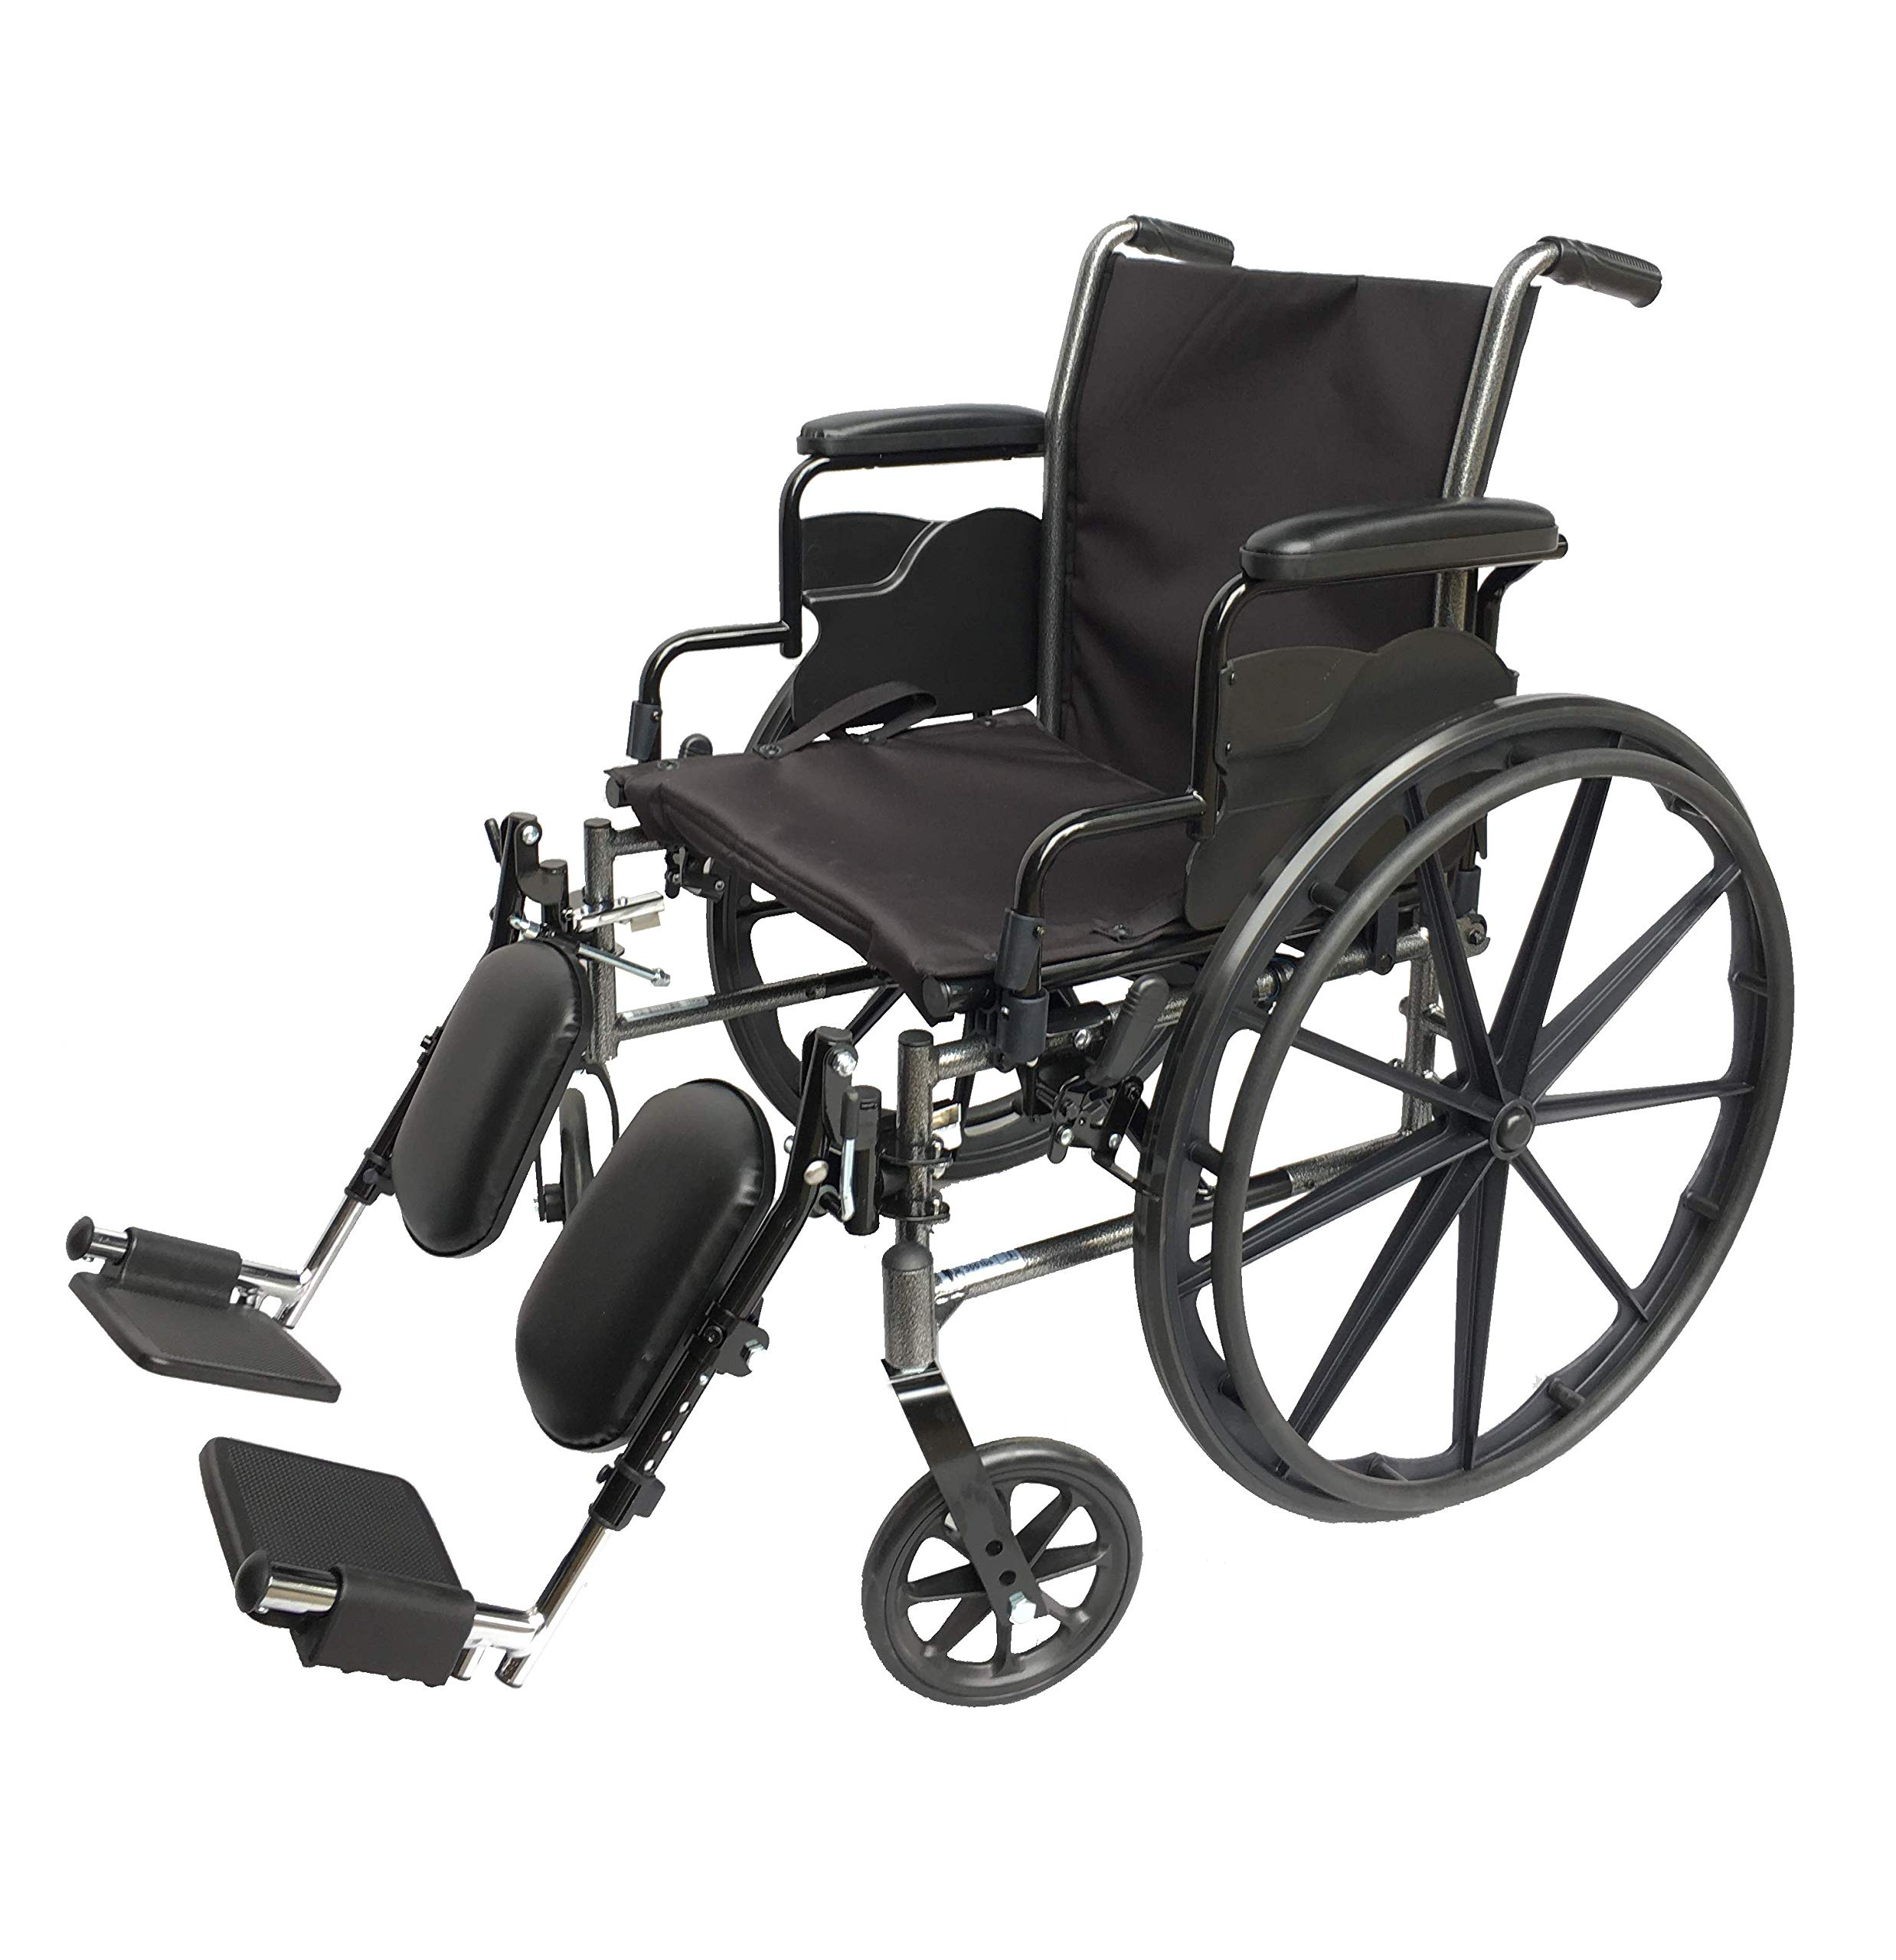 Med-Elite Deluxe Wheelchair - Elevating Leg Rests - Desk-Length Arm Rests - Padded Nylon Seat (18'' Seat) by Med-Elite Innovation